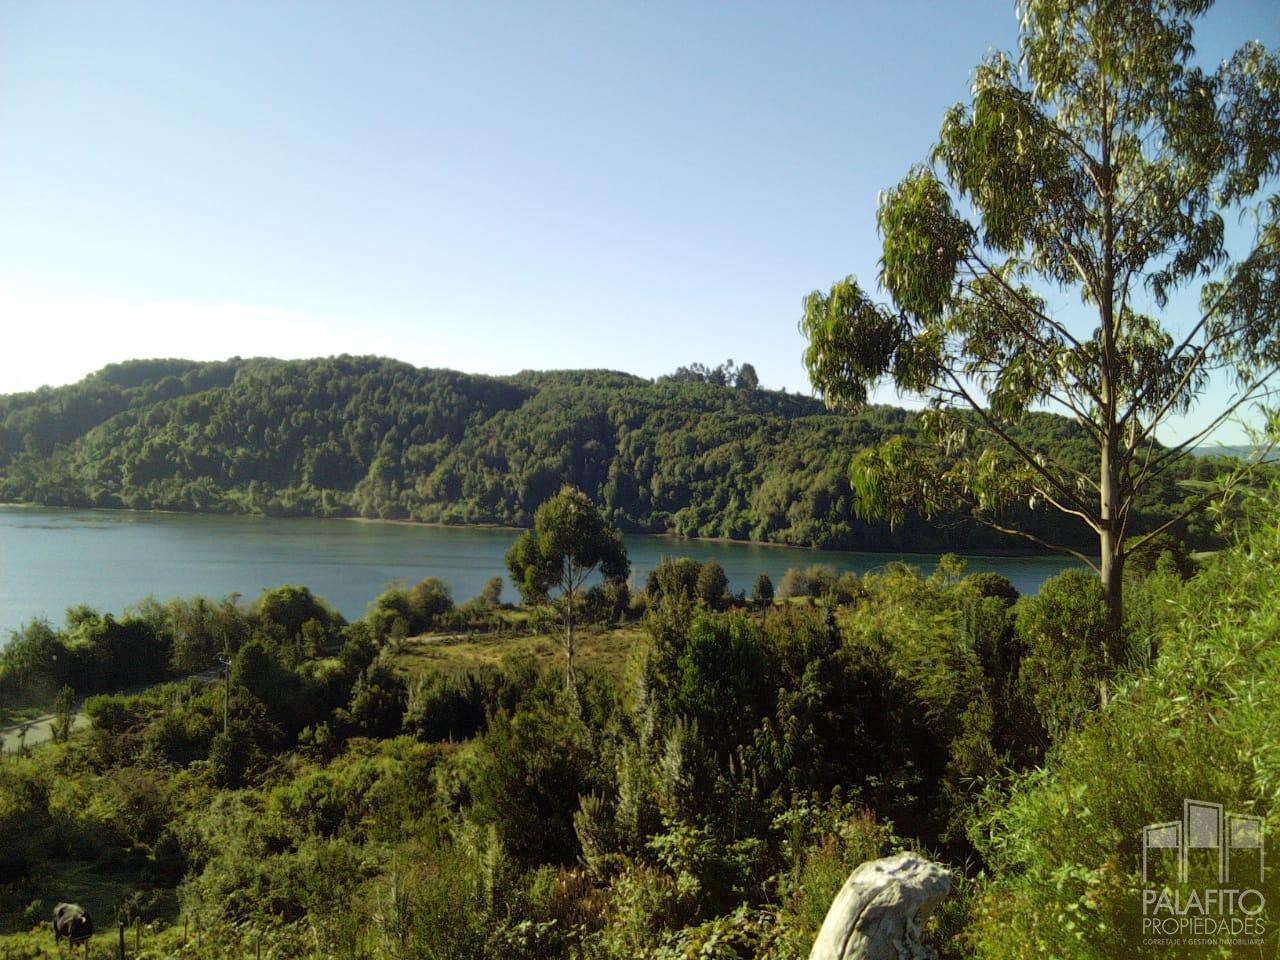 Campo 7,96 hectáreas, con orilla de Mar, Quellón